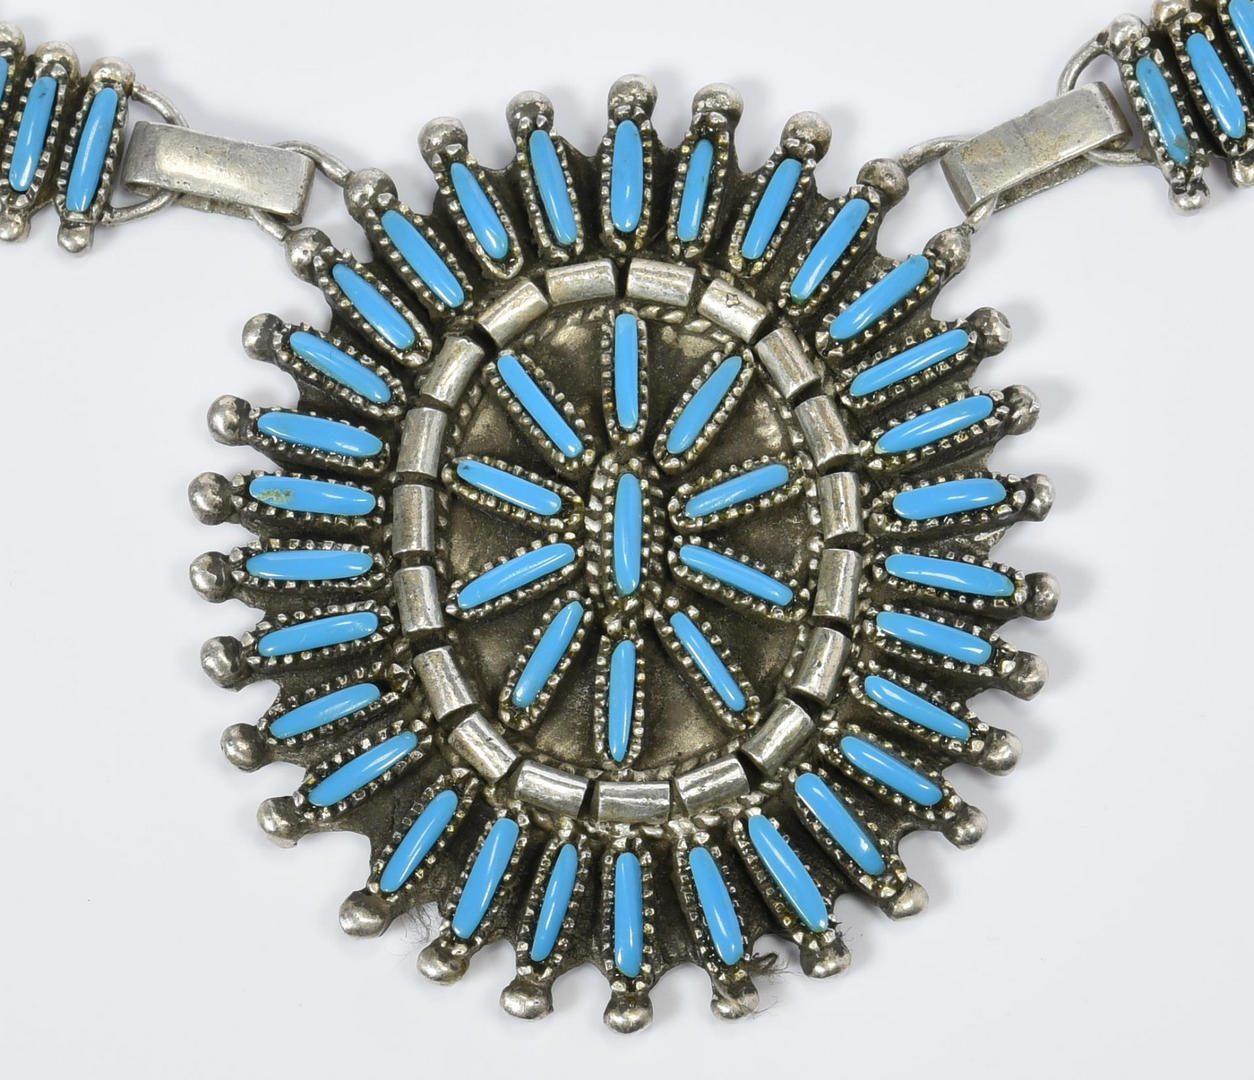 Lot 219: Benson Yazzie Navajo Necklace